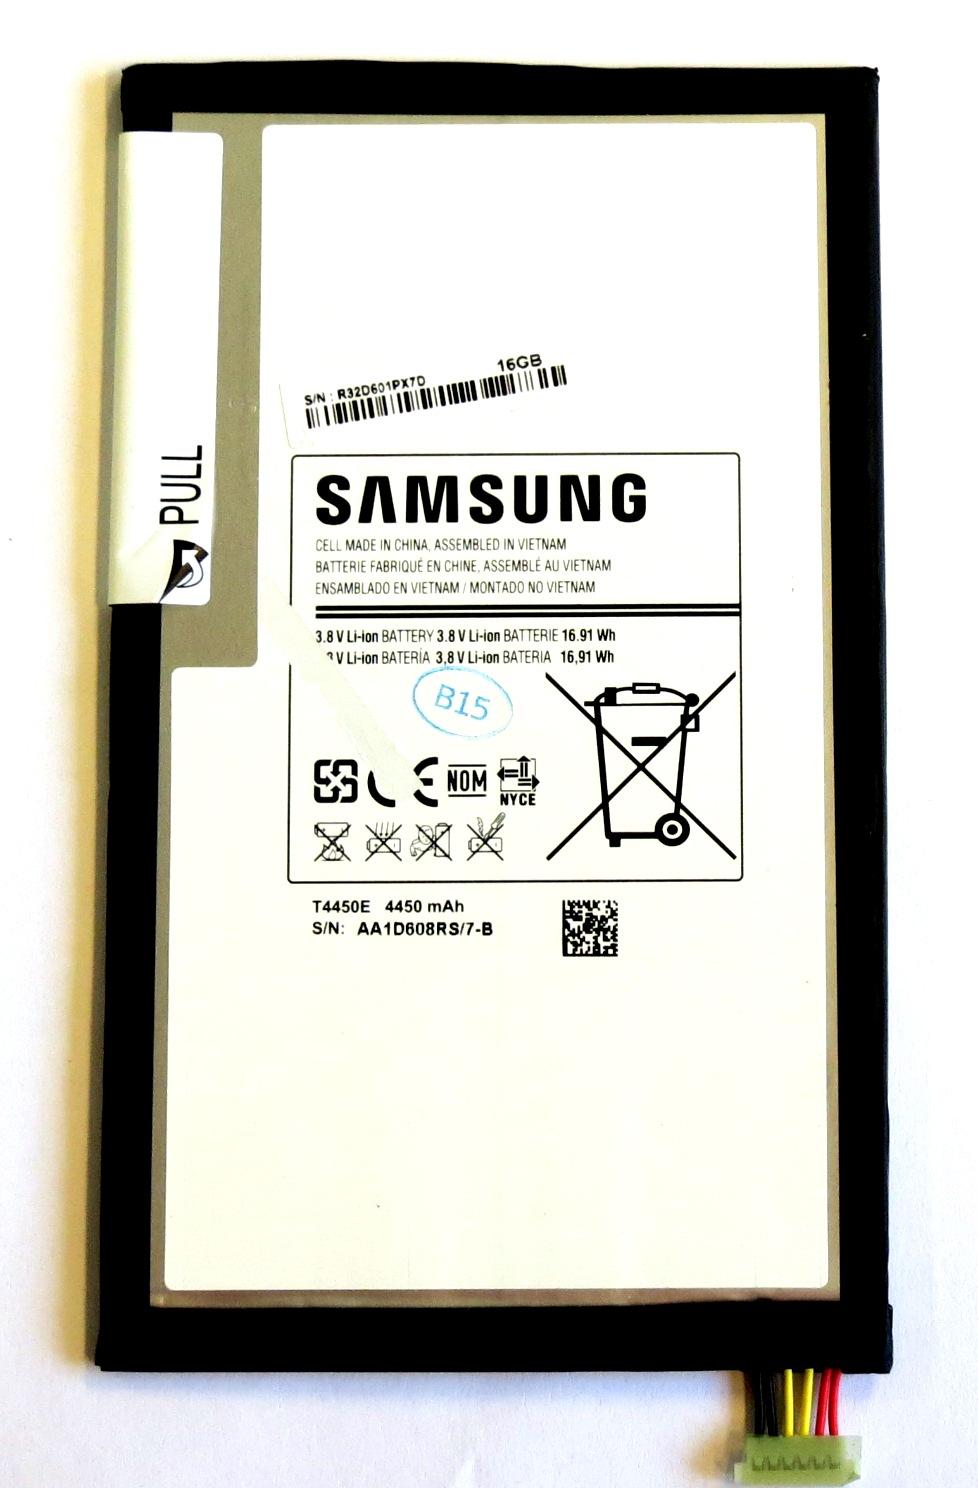 Baterie Samsung T4450E, 4450mAh Li-Ion